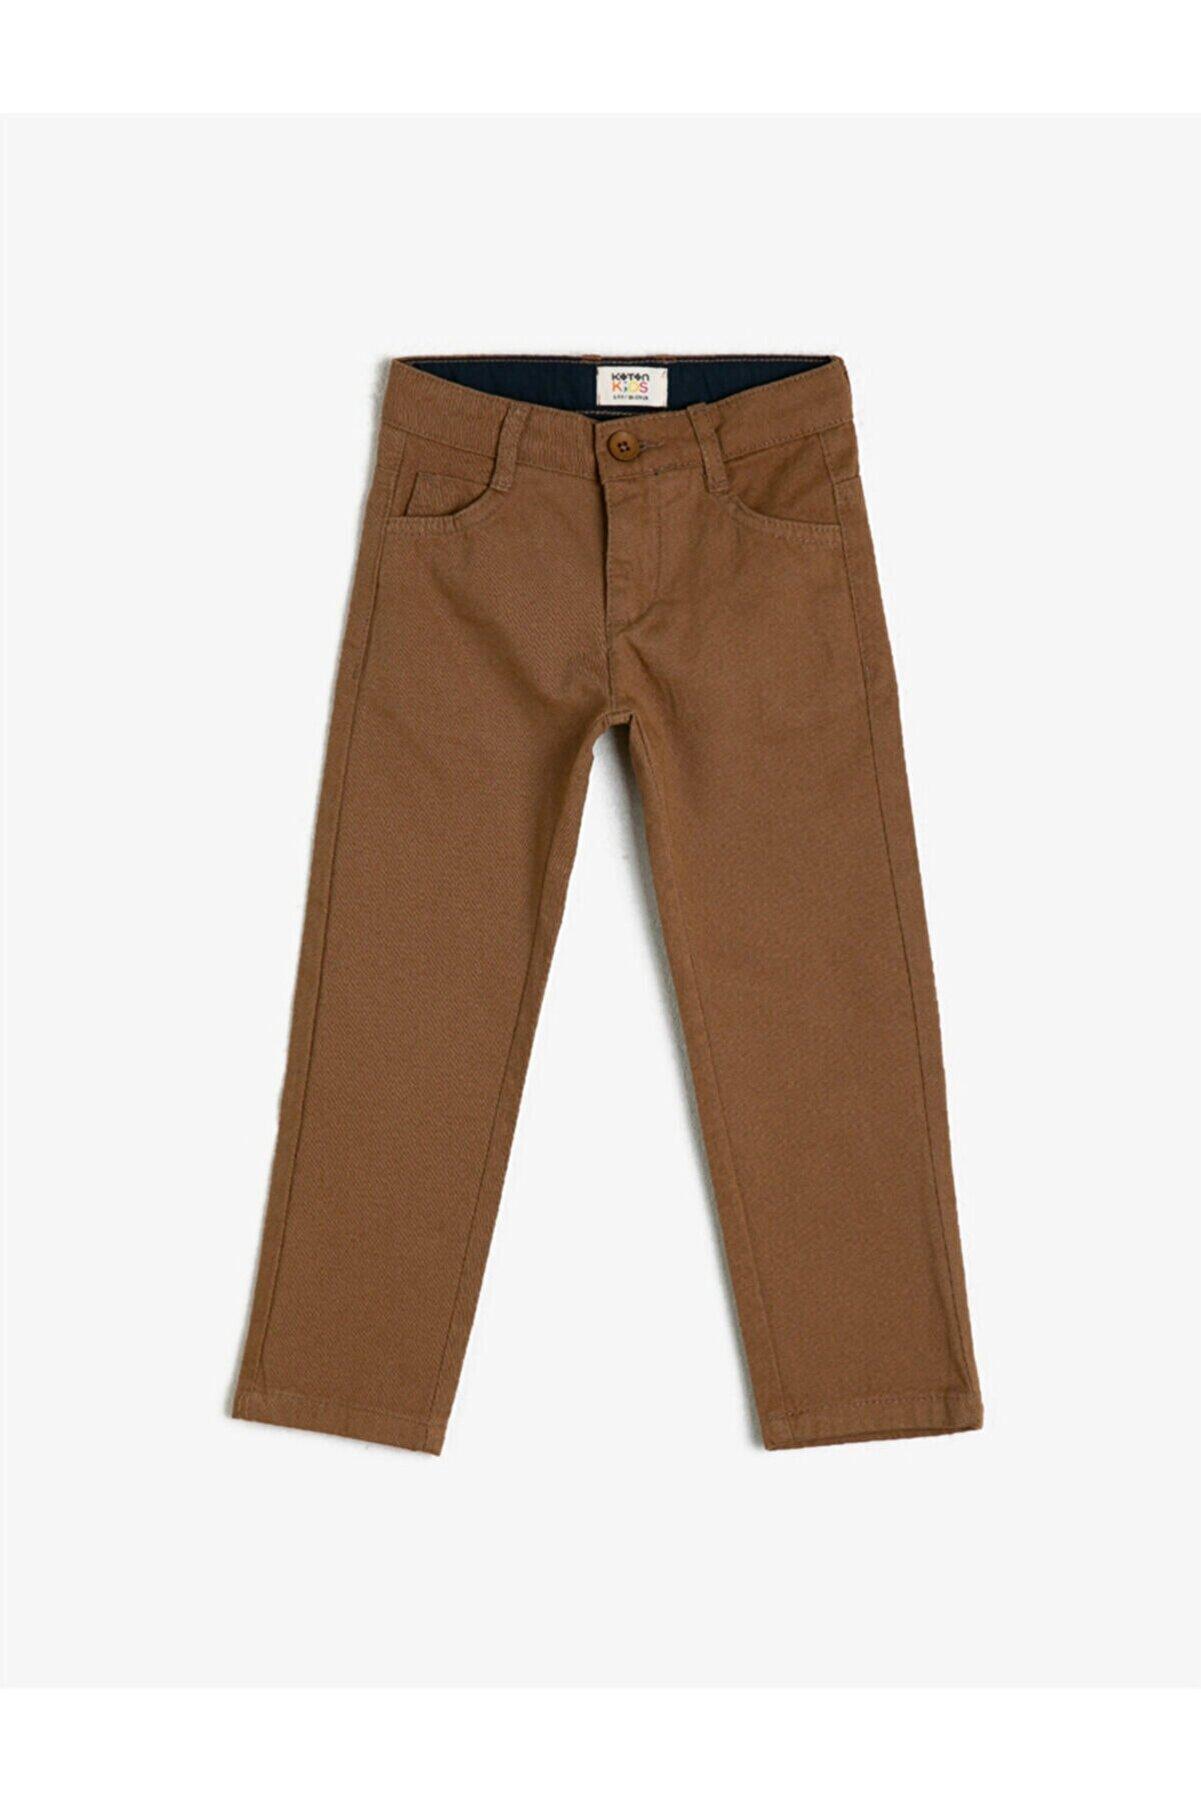 Koton Erkek Çocuk Kahverengi Pamuk Cepli Pantolon